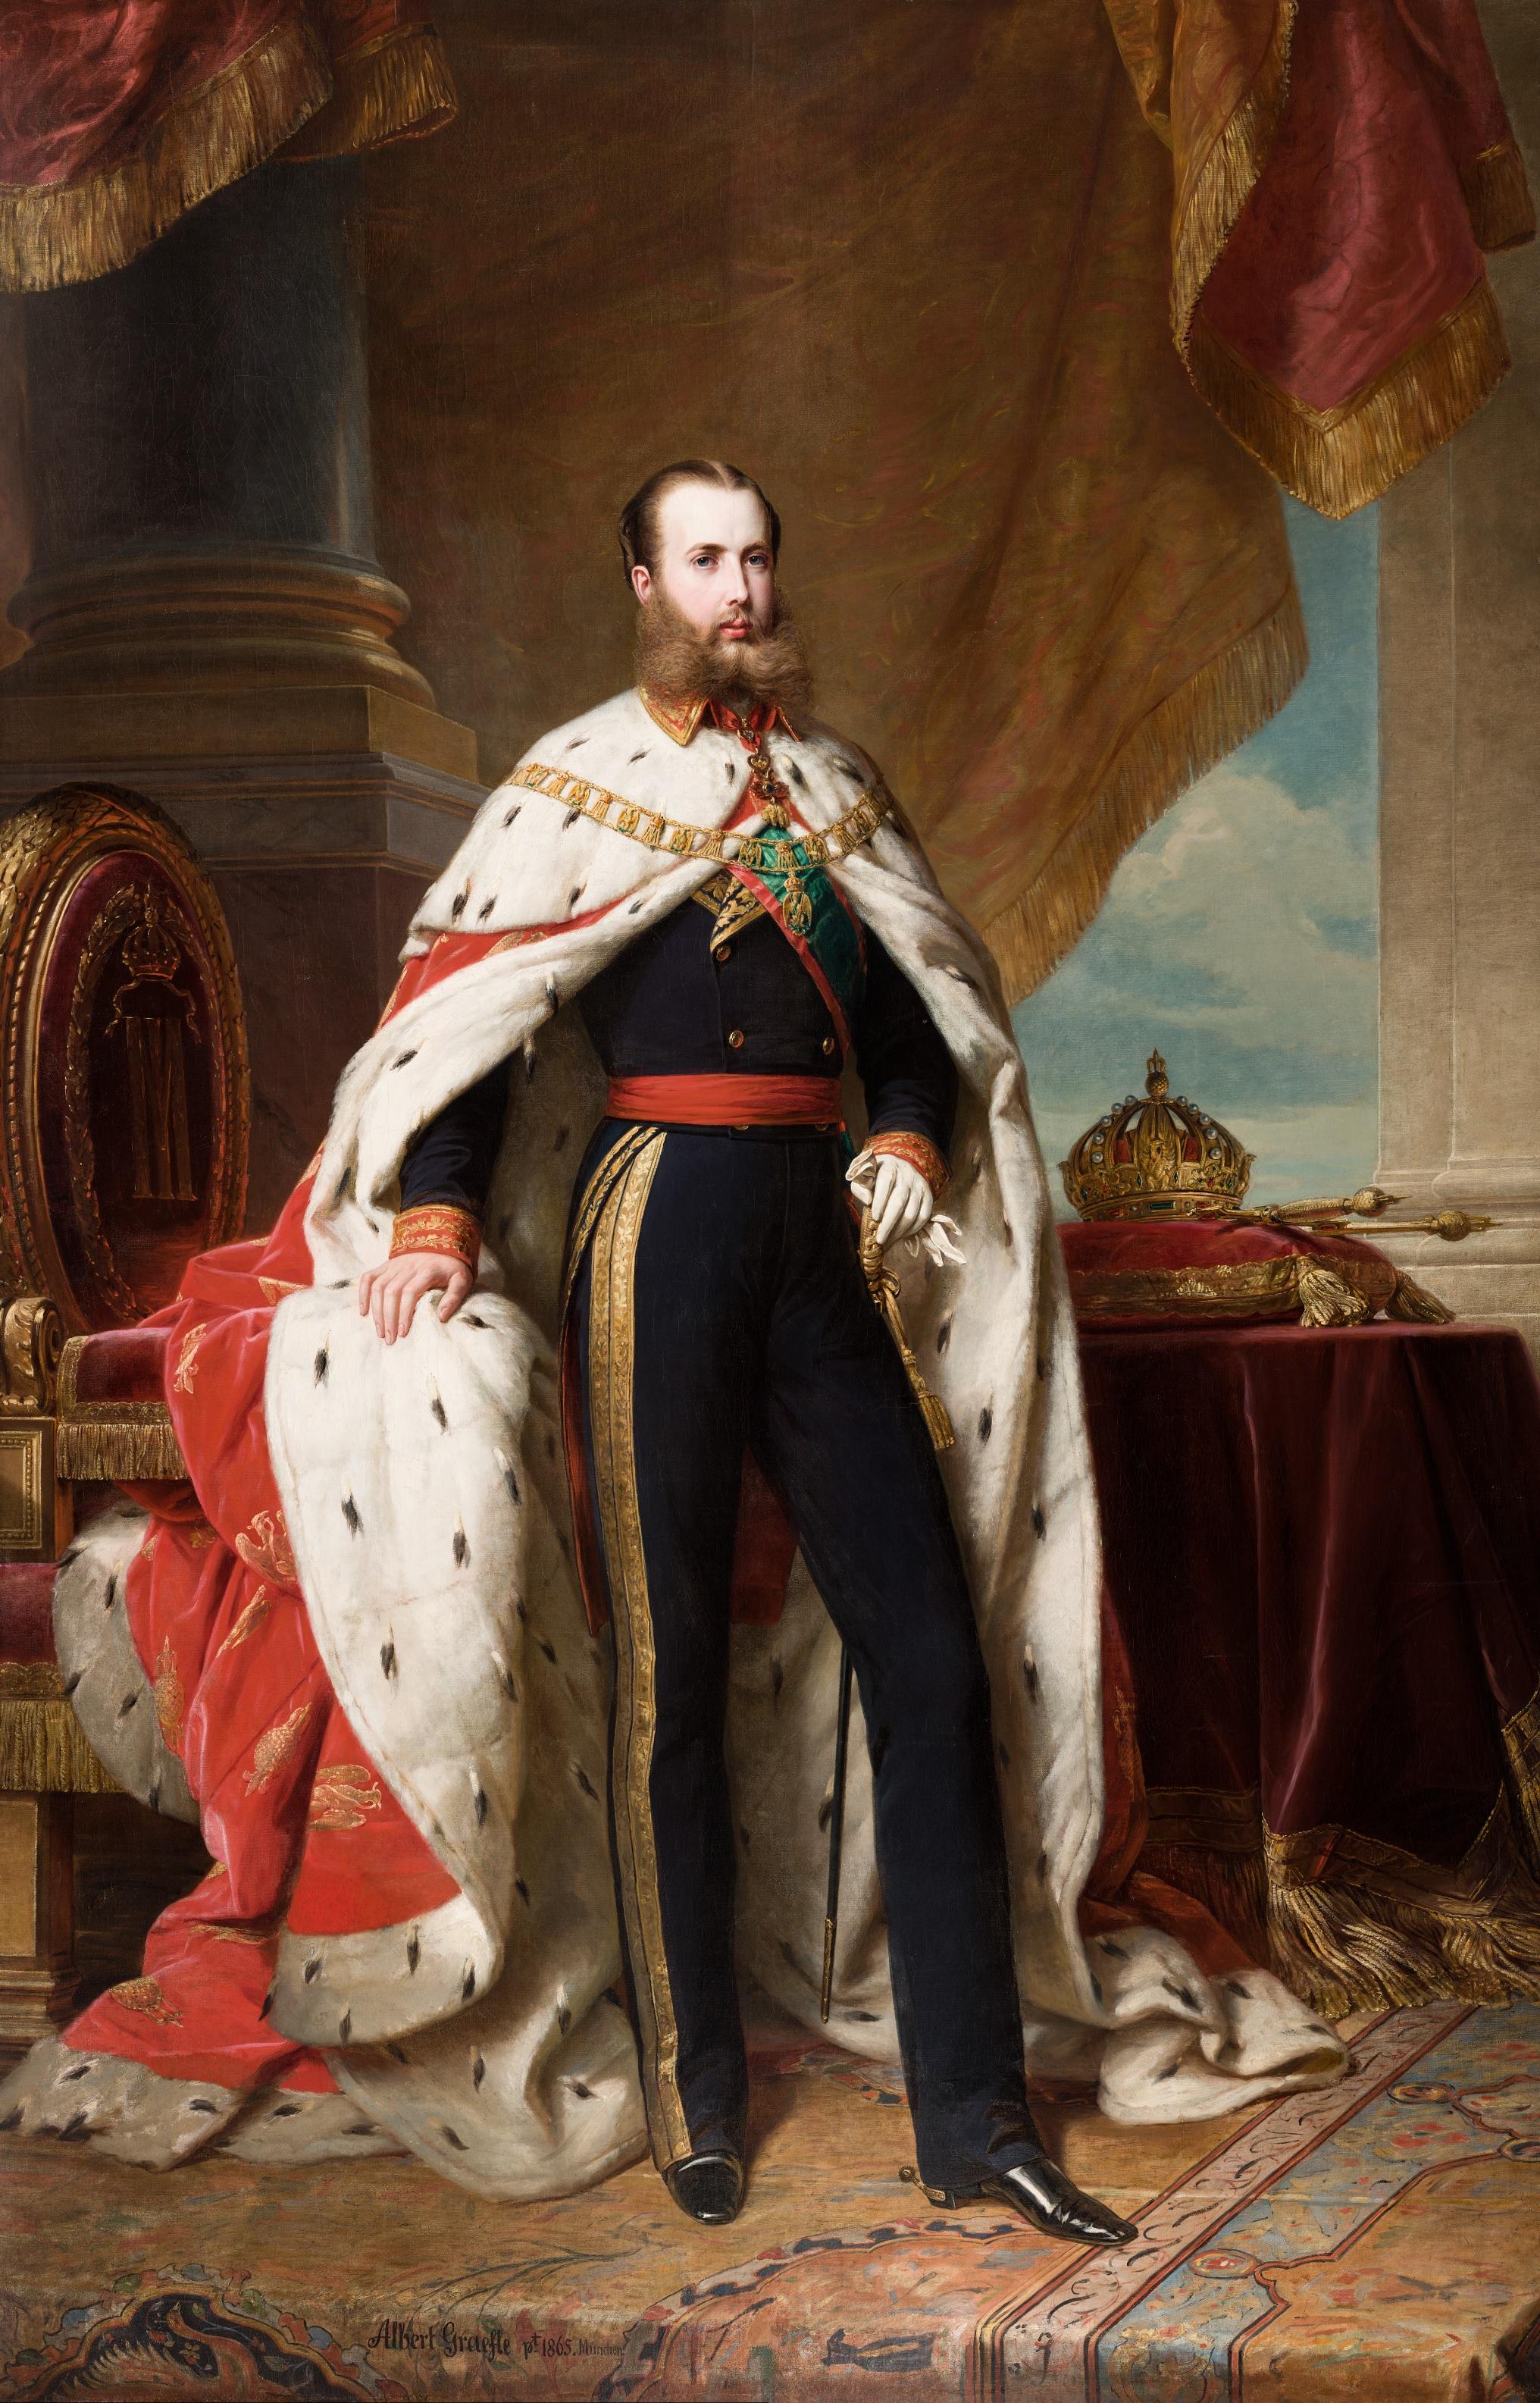 Maximiliano de México - Wikipedia, la enciclopedia libre